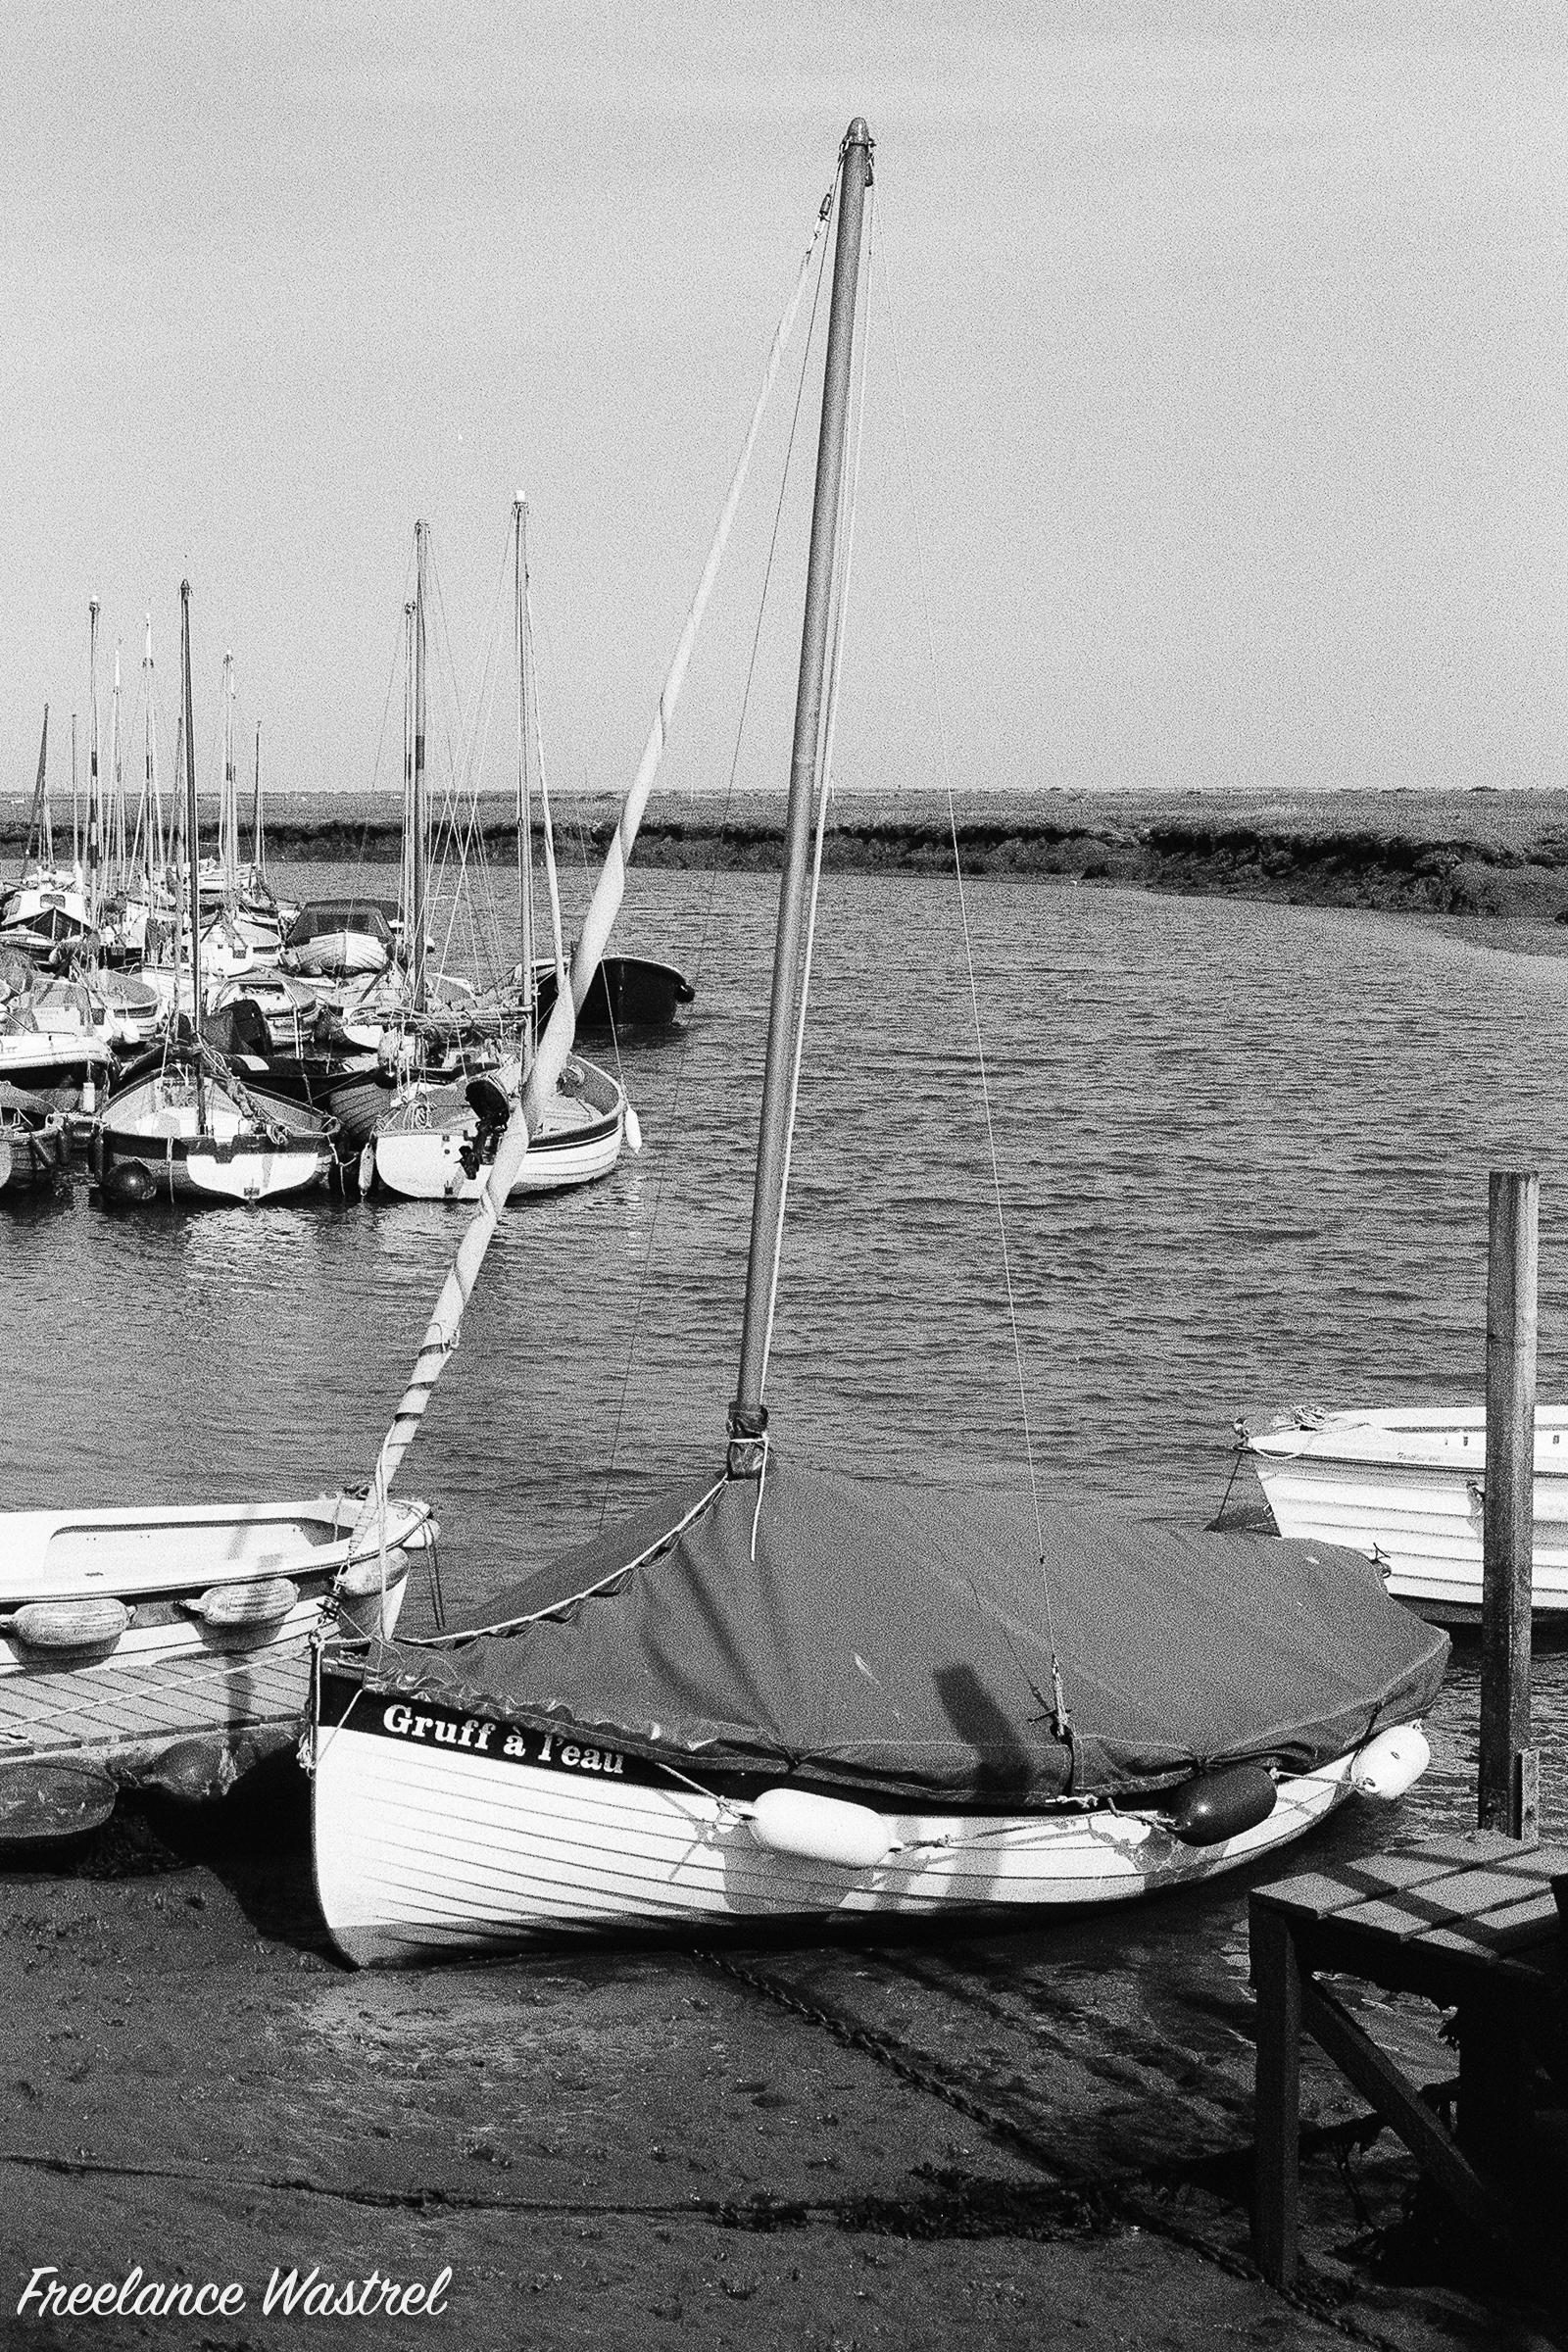 Gruff à l'eau, Morston Quay